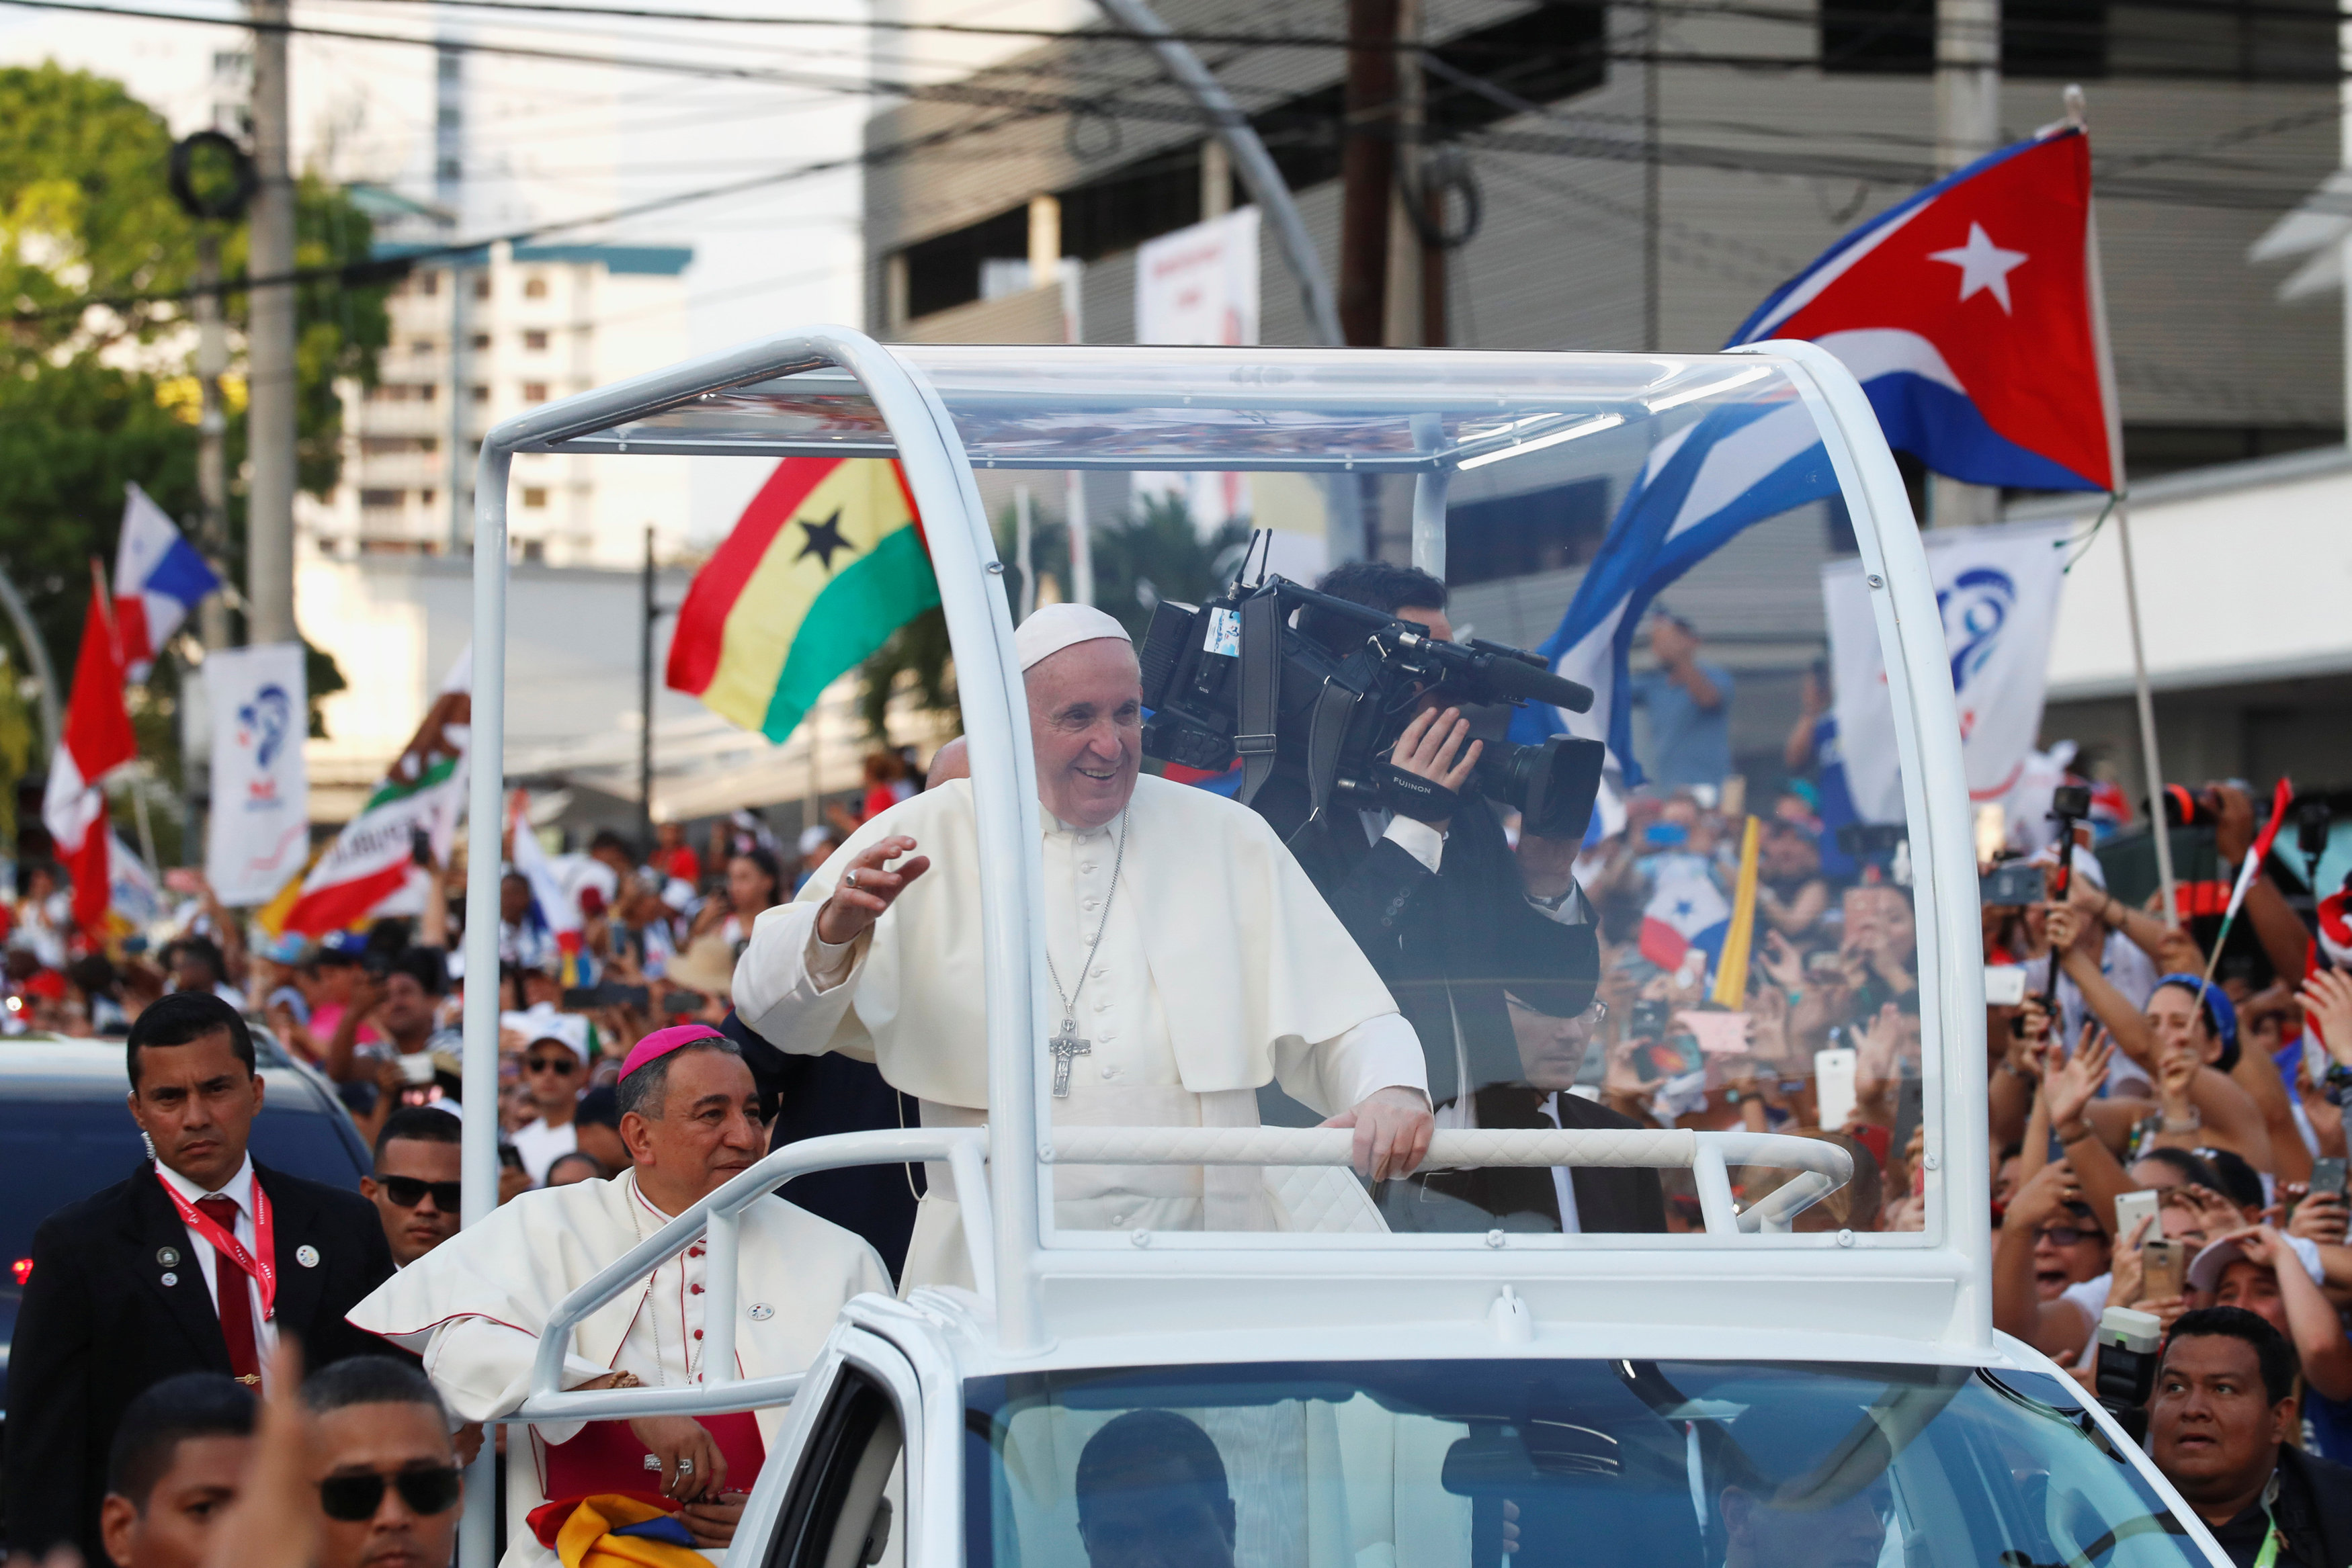 استقبال حاشد لبابا الفاتيكان لدى وصوله بنما  (4)